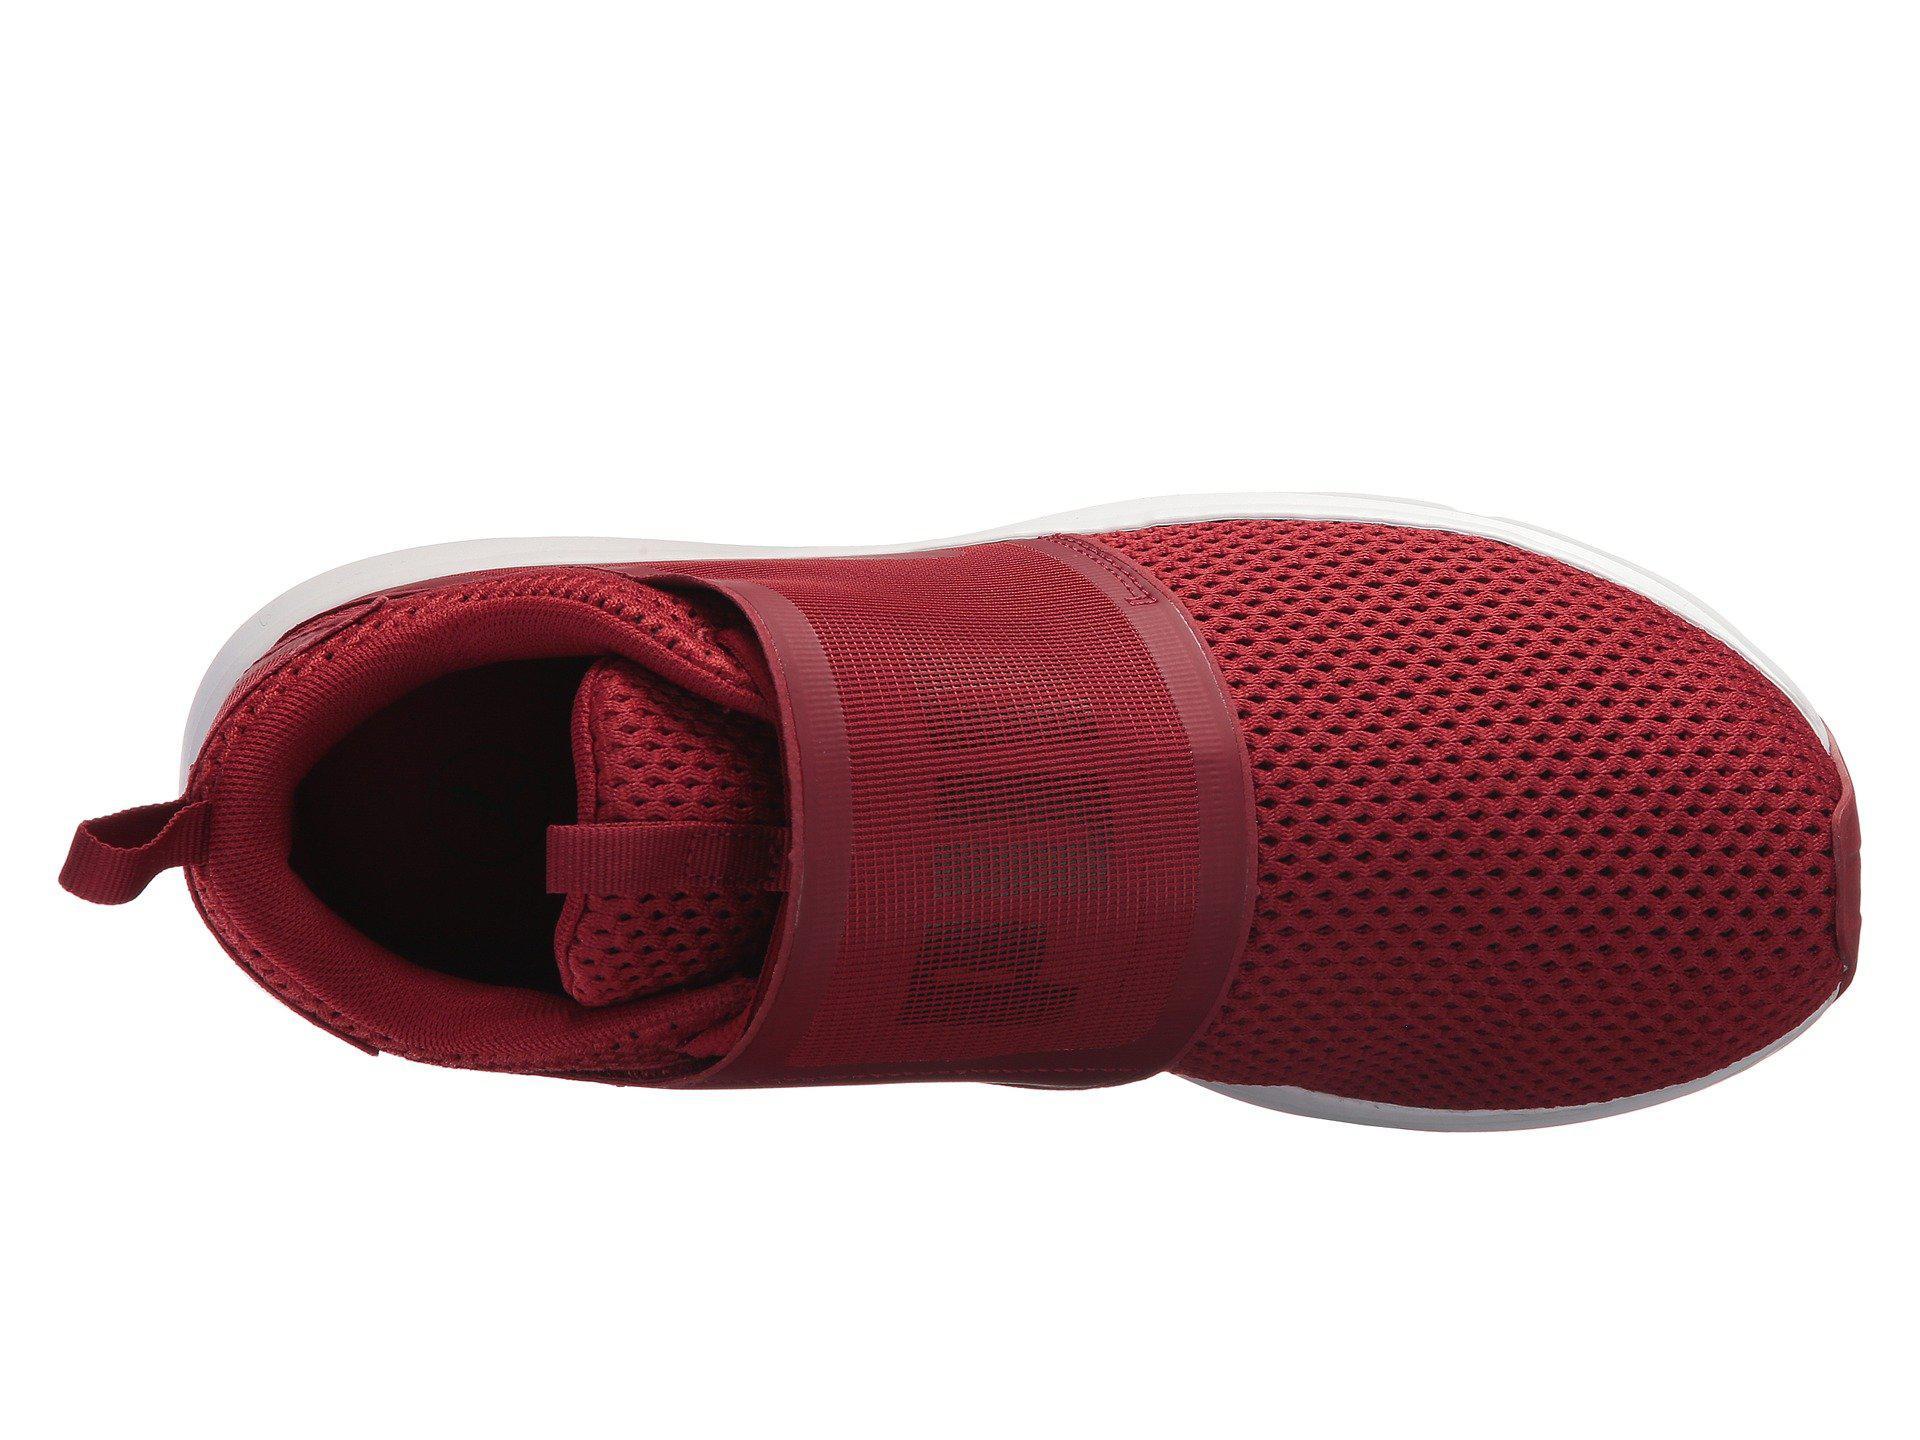 167a9bd8d42911 PUMA - Red Enzo Strap Mesh for Men - Lyst. View fullscreen